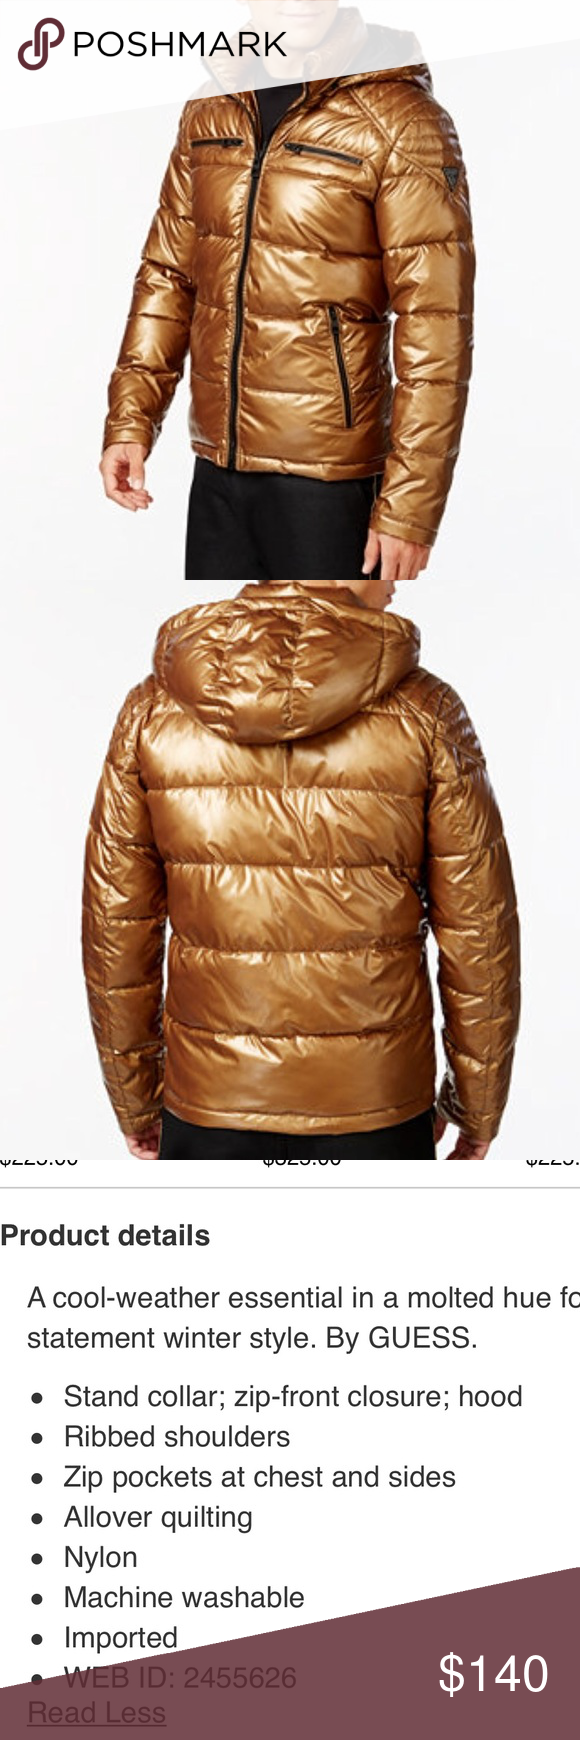 Nwot Guess Men S Metalllic Gold Puffer Coat Guess Metallic Gold Puffer Coat Nwot No Damage In Same Condition As Bought In Sto Puffer Coat Guess Men Puffer [ 1740 x 580 Pixel ]